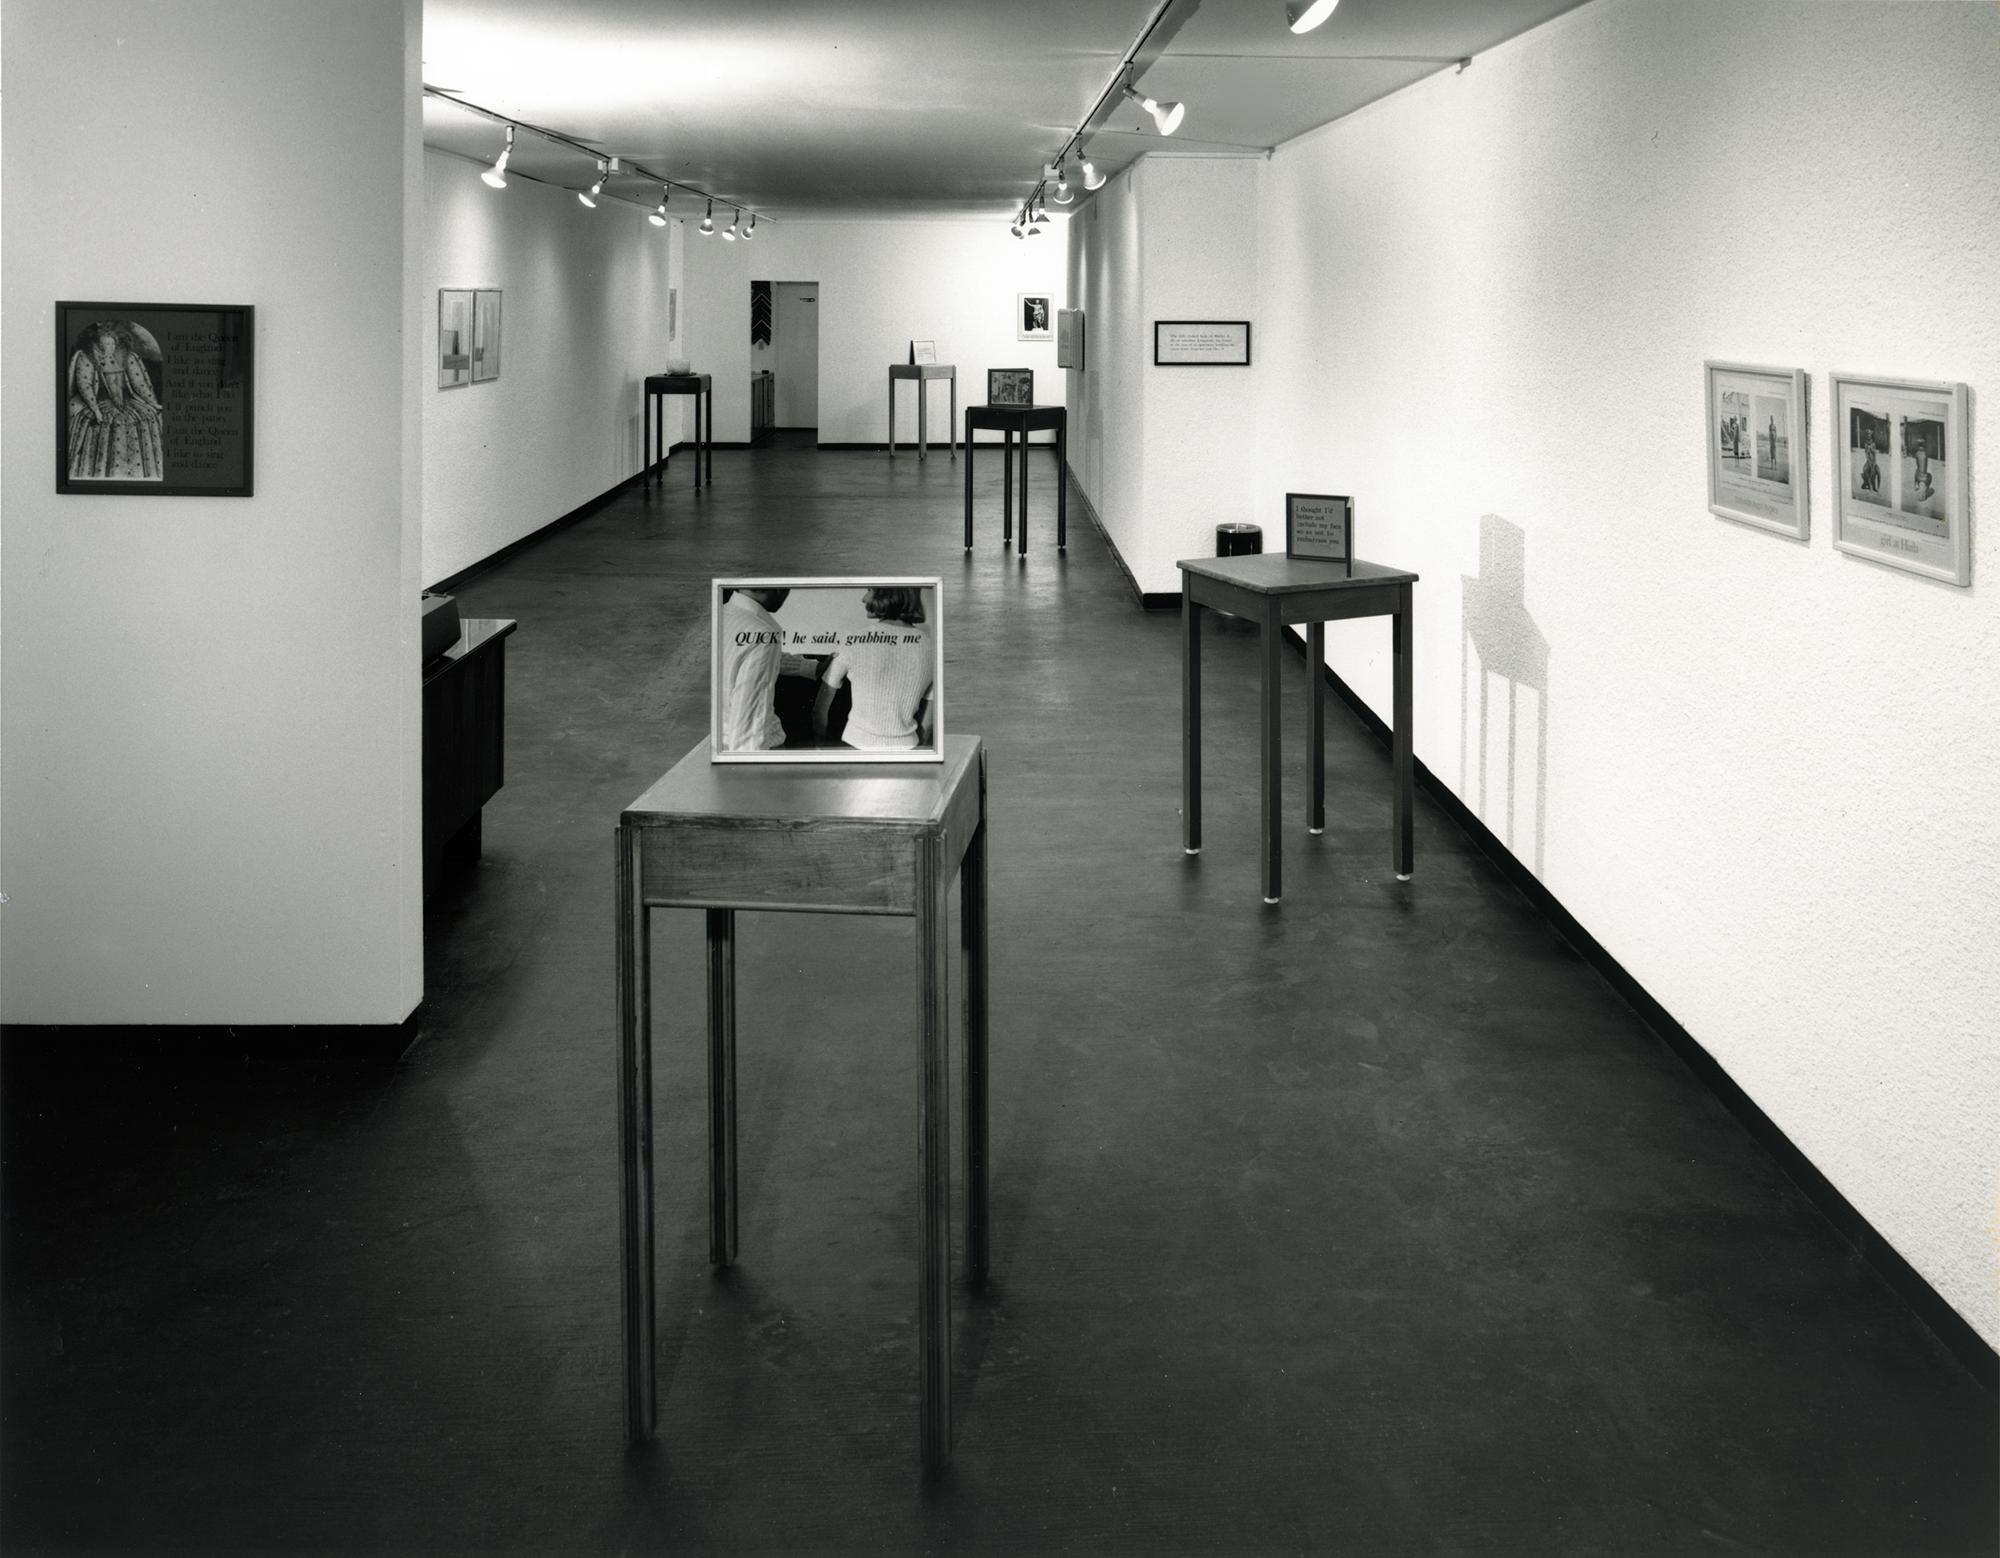 Ian Carr-Harris at the Carmen Lamanna Gallery, September 22 - October 11, 1973